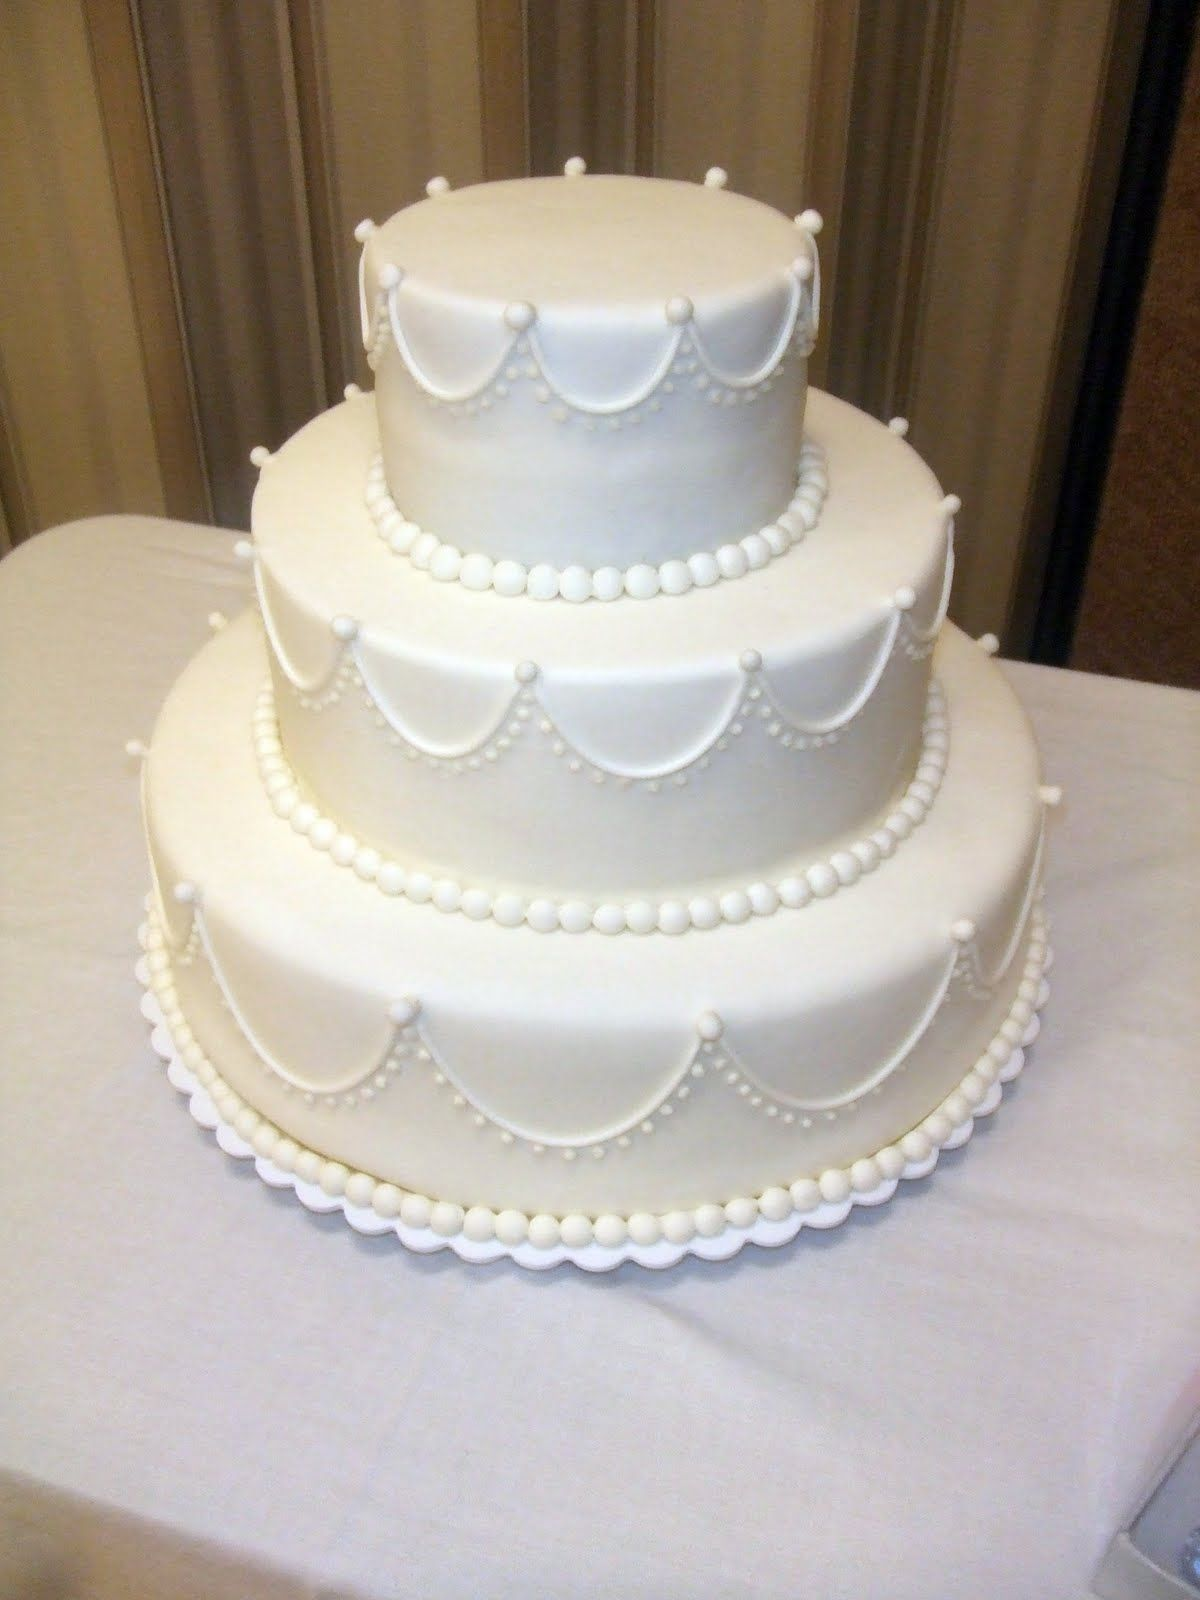 Traditional Wedding Cake Classic Wallpaper HD